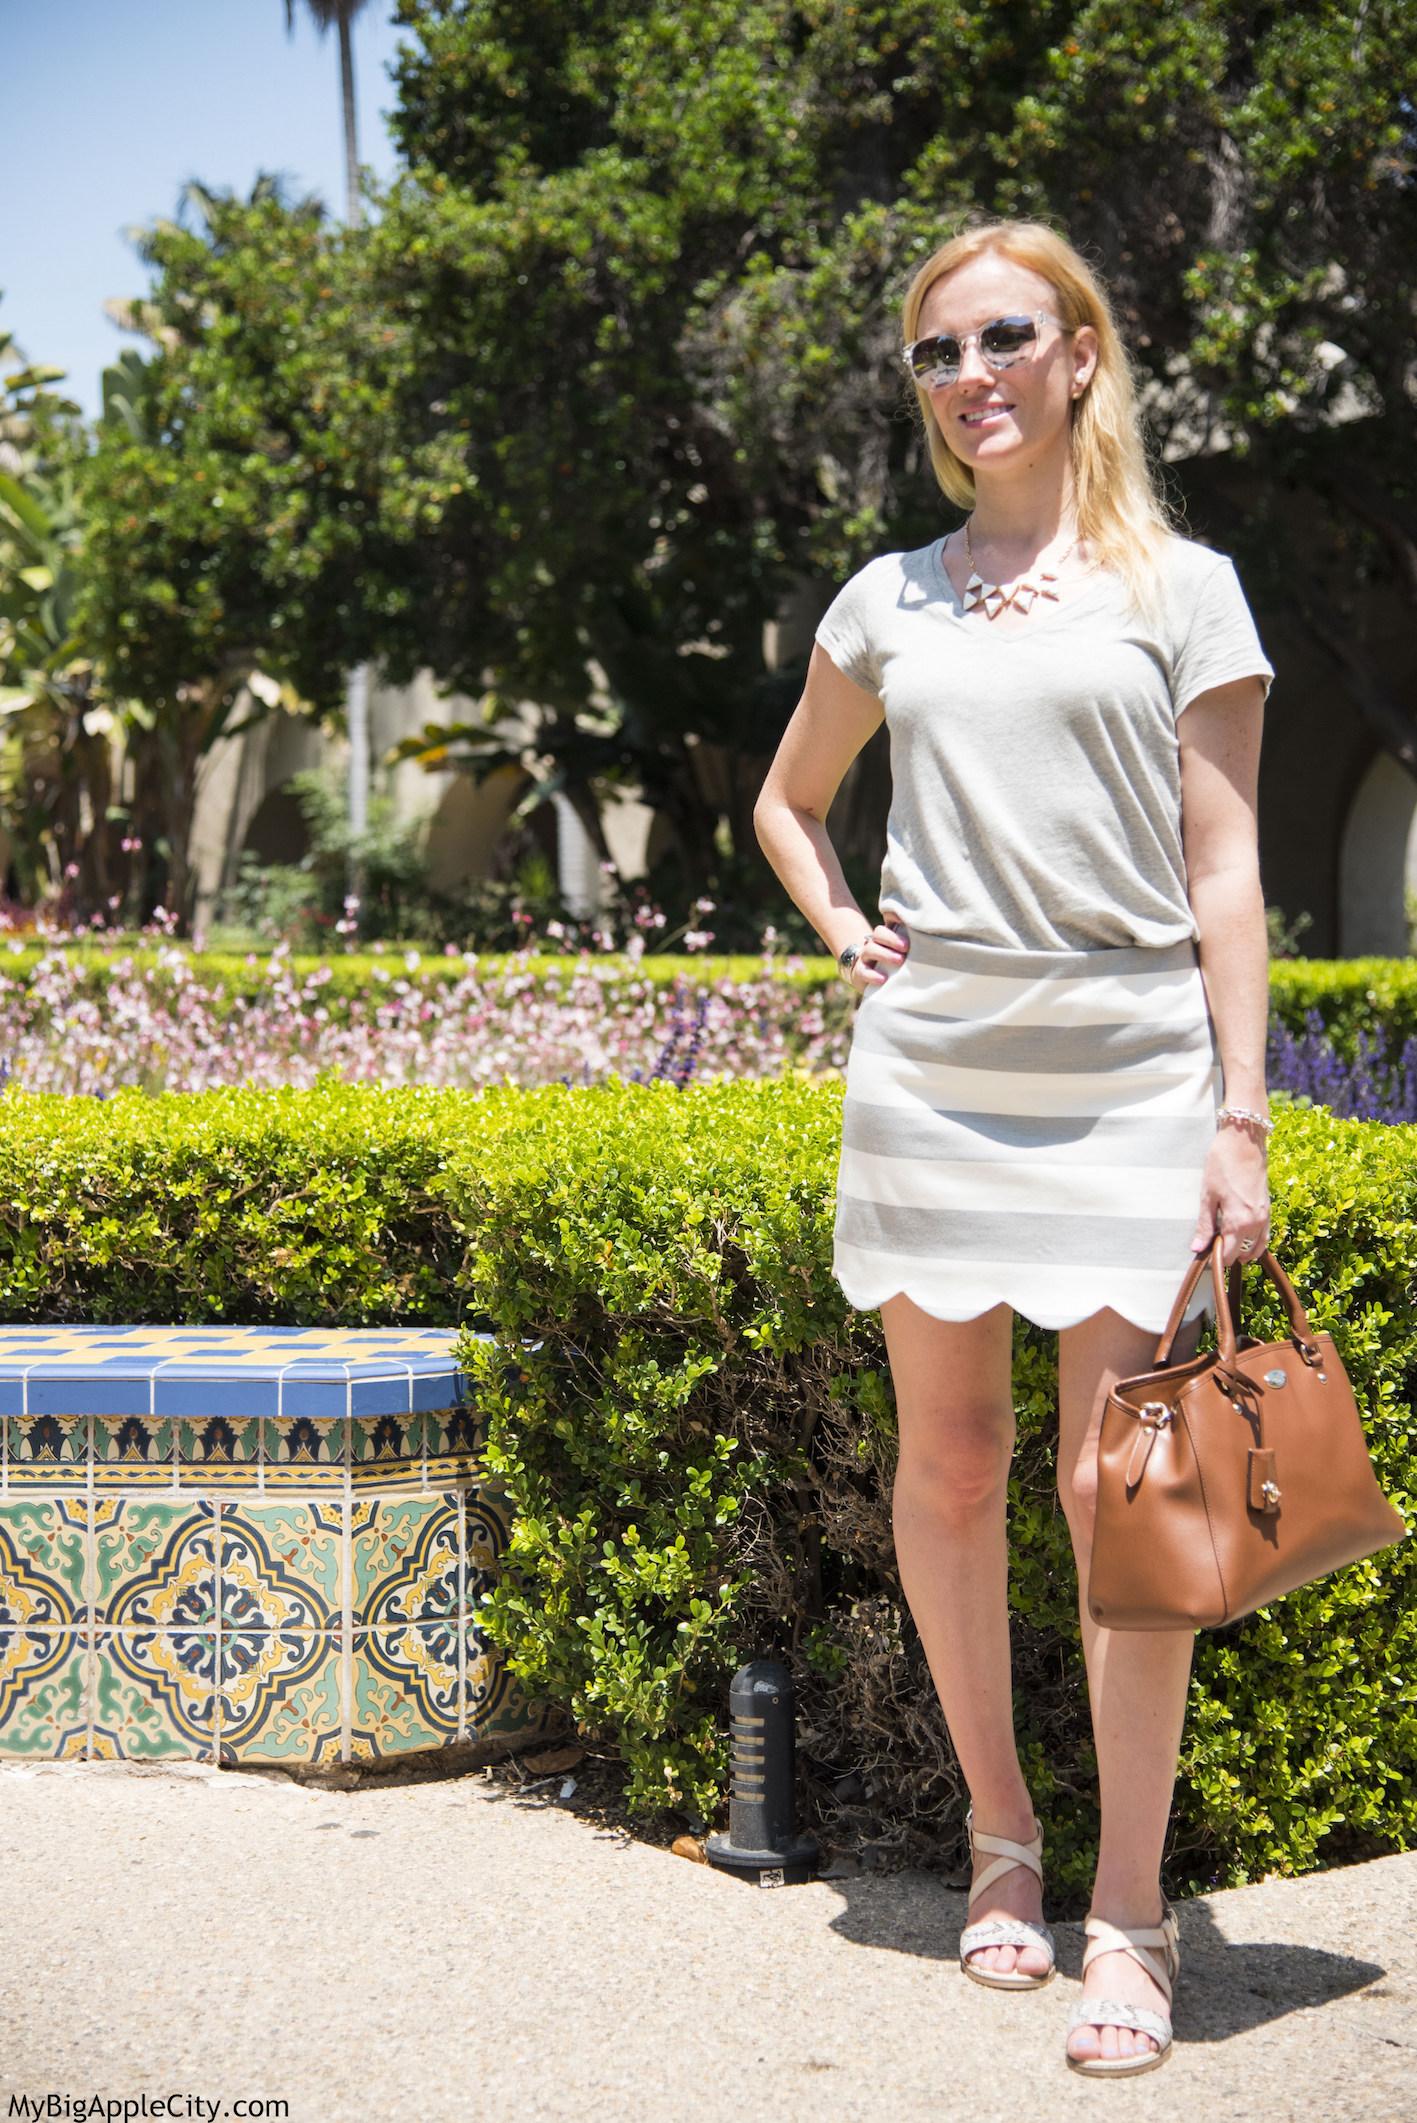 Topshop-OOTD-Fashion-blogger-nyc-travelstyle-mybigapplecity